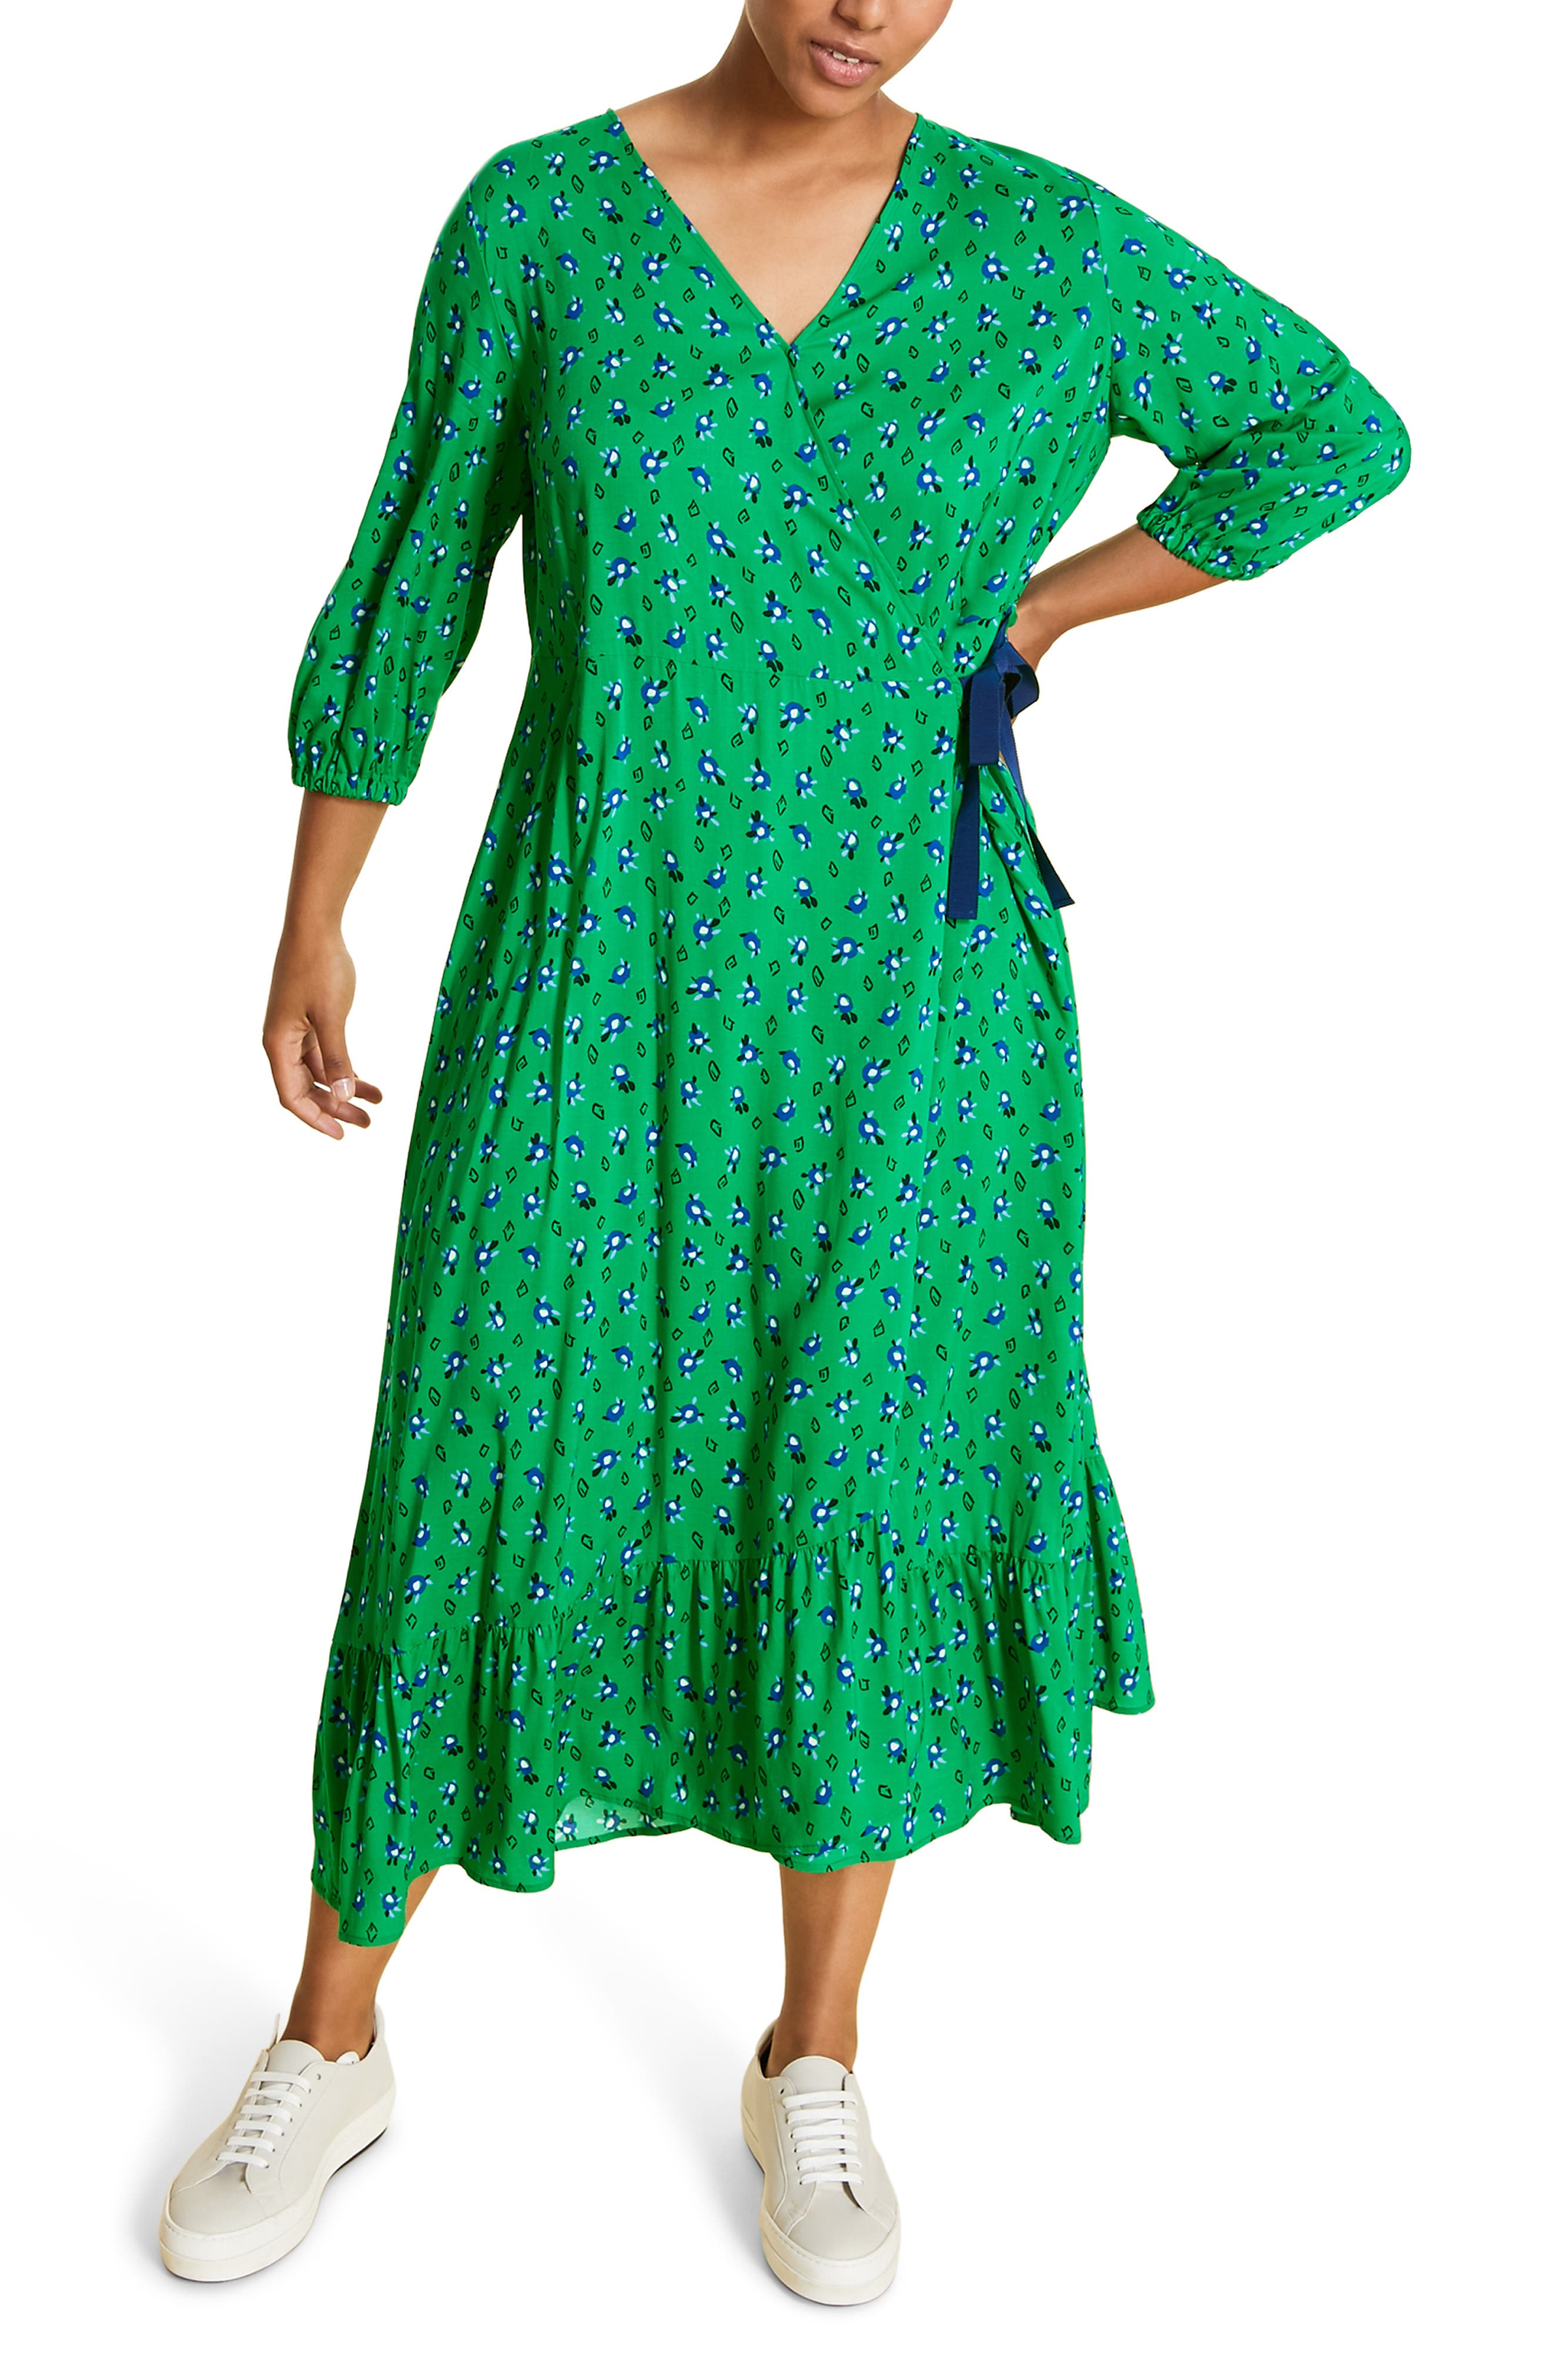 Plus Size Marina Rinaldi Destro Wrap Midi Dress, Green